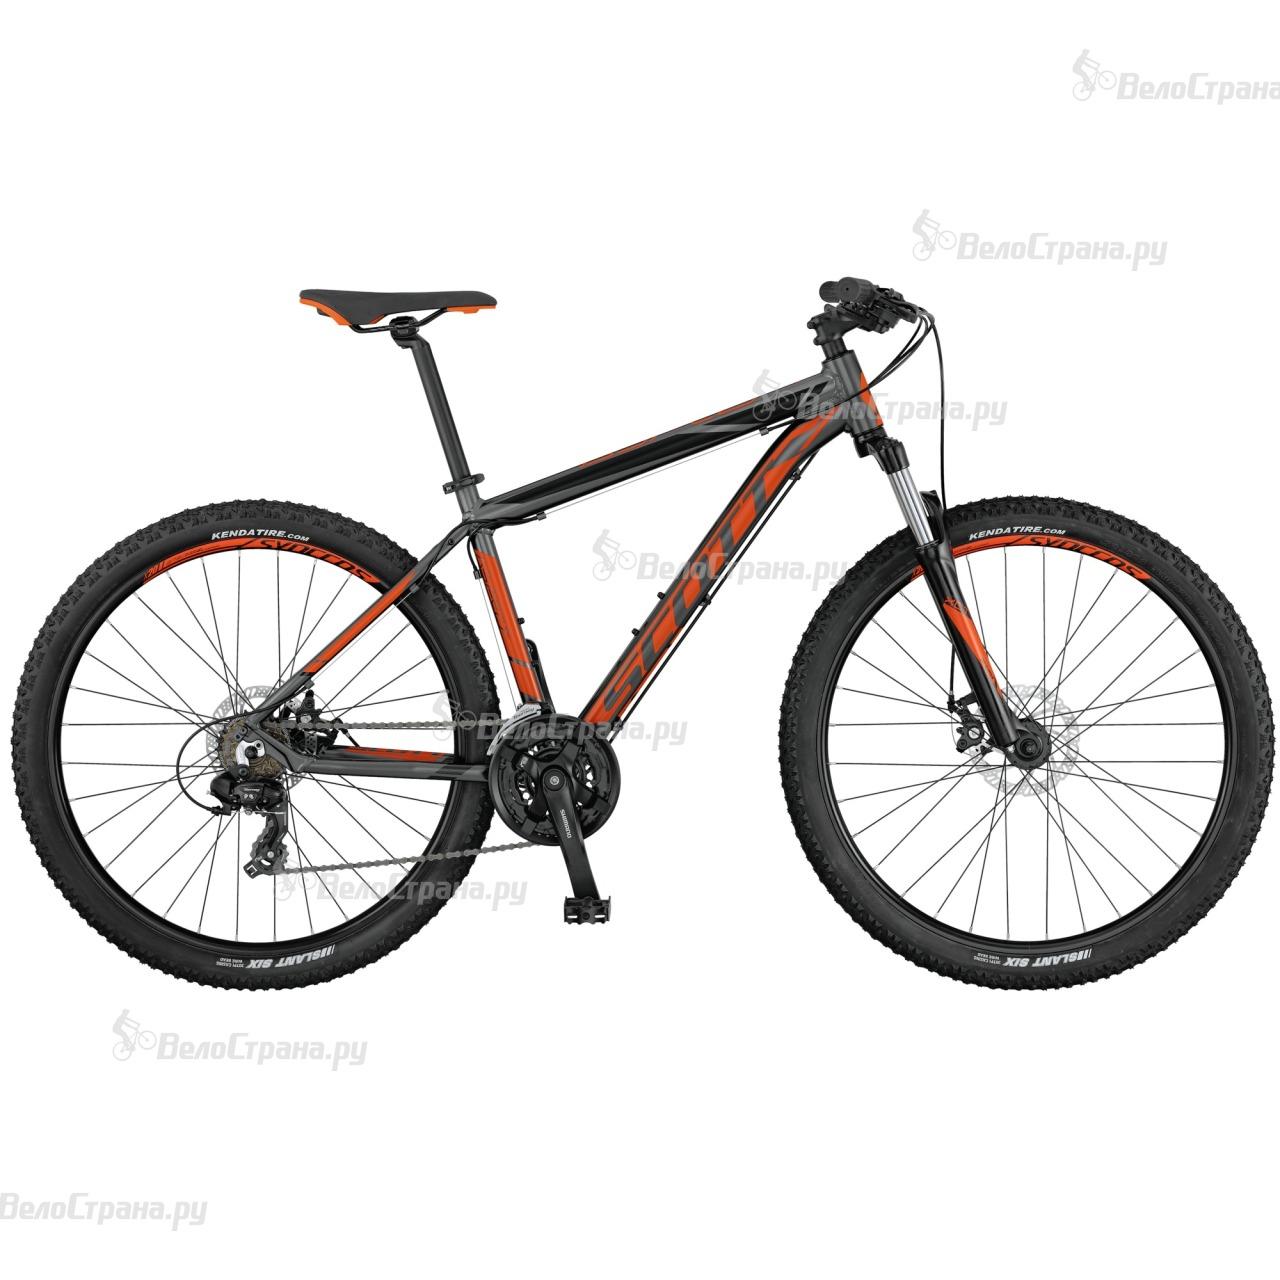 Велосипед Scott Aspect 970 (2017)